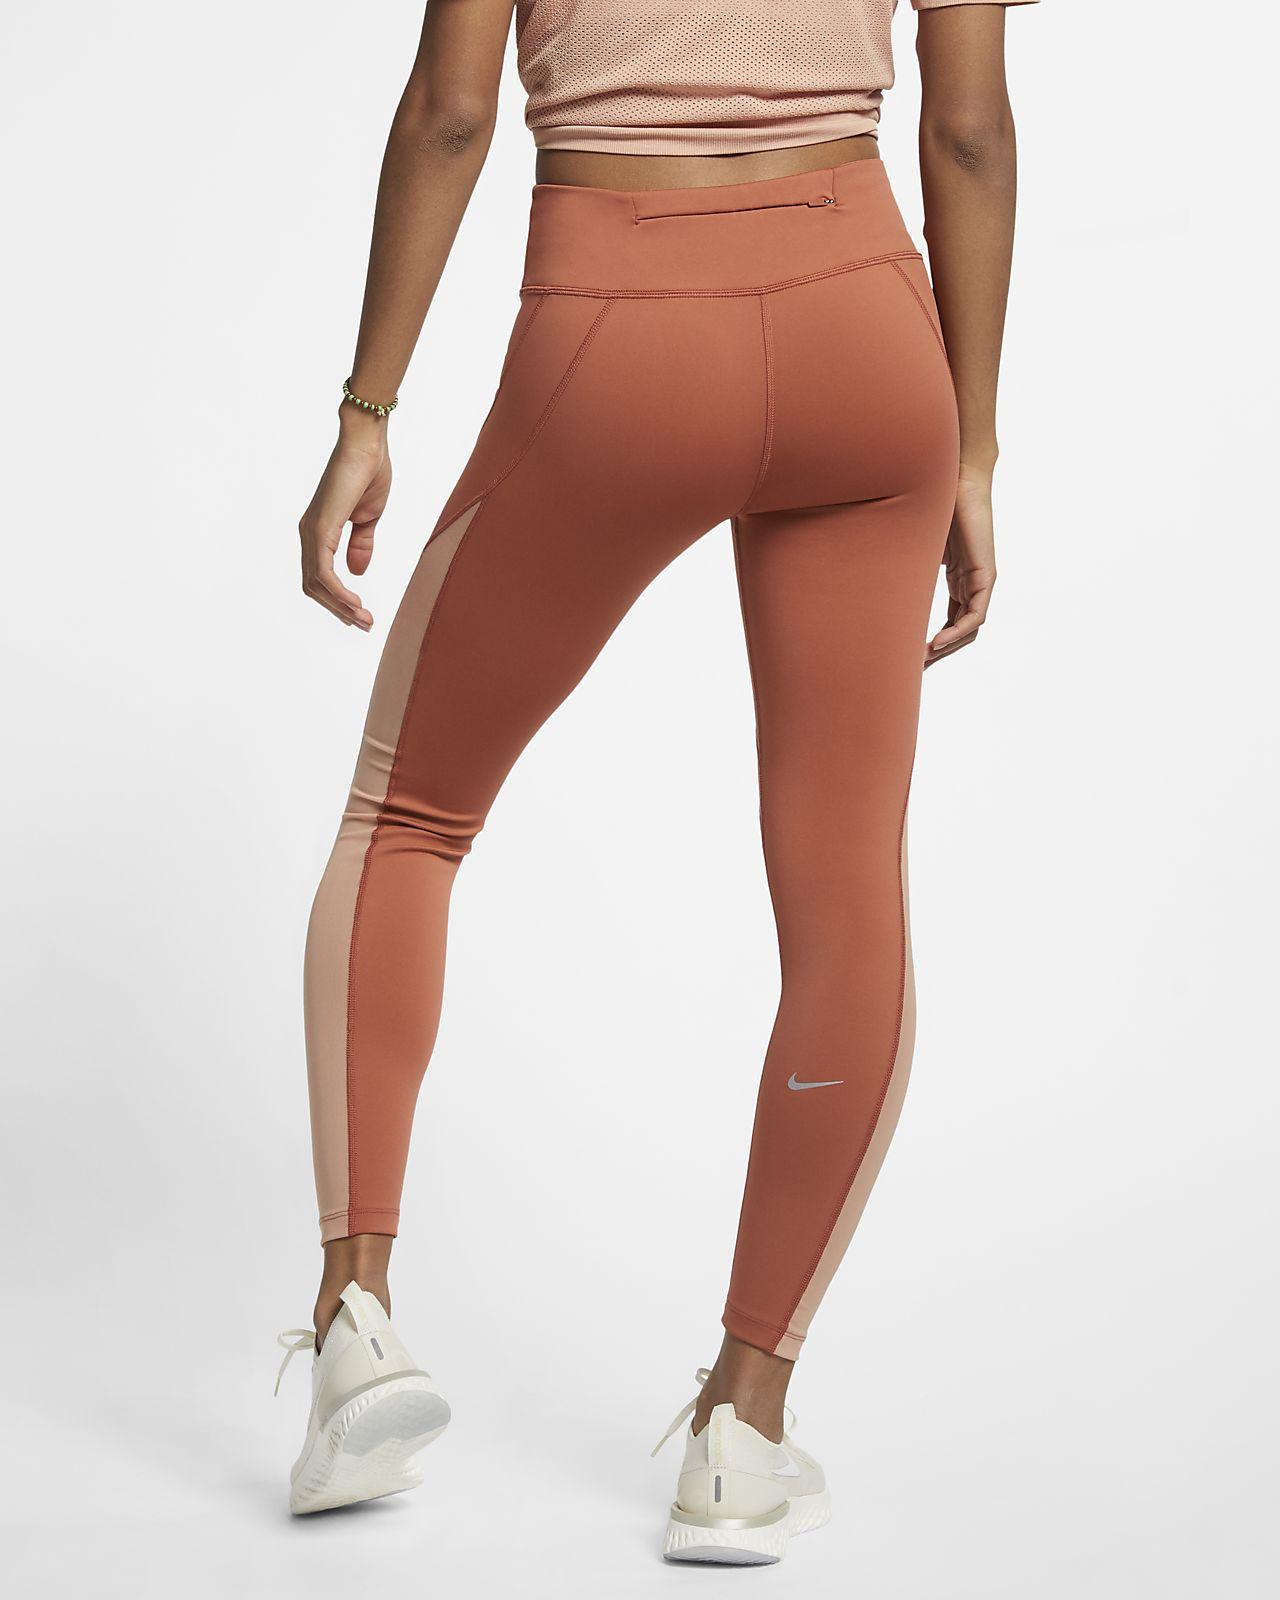 1a3f475ffe Nike Epic Lux 7/8-os testhezálló női futónadrág. Nike.com HU